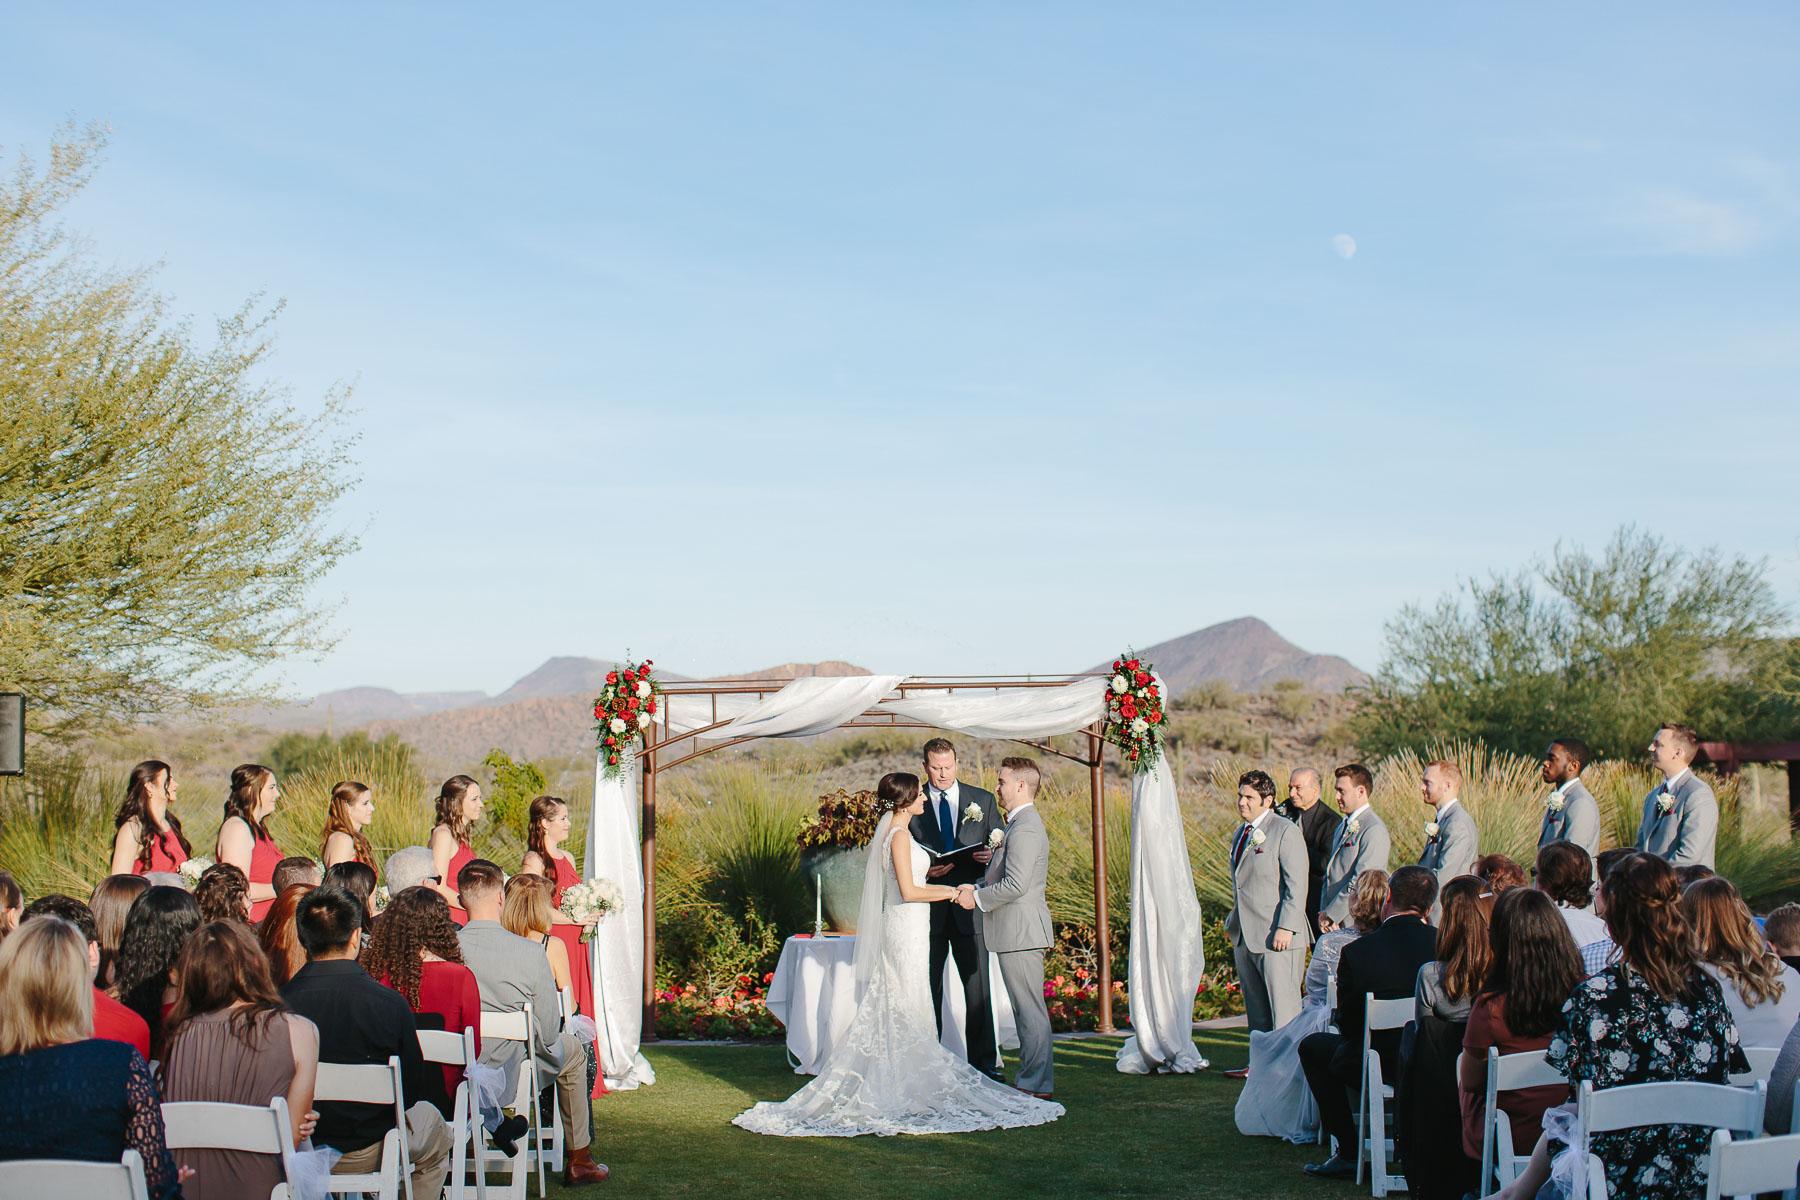 161210-Luxium-Weddings-Arizona-Matt-Jenny-Anthem-Golf-Country-Club-1034.jpg